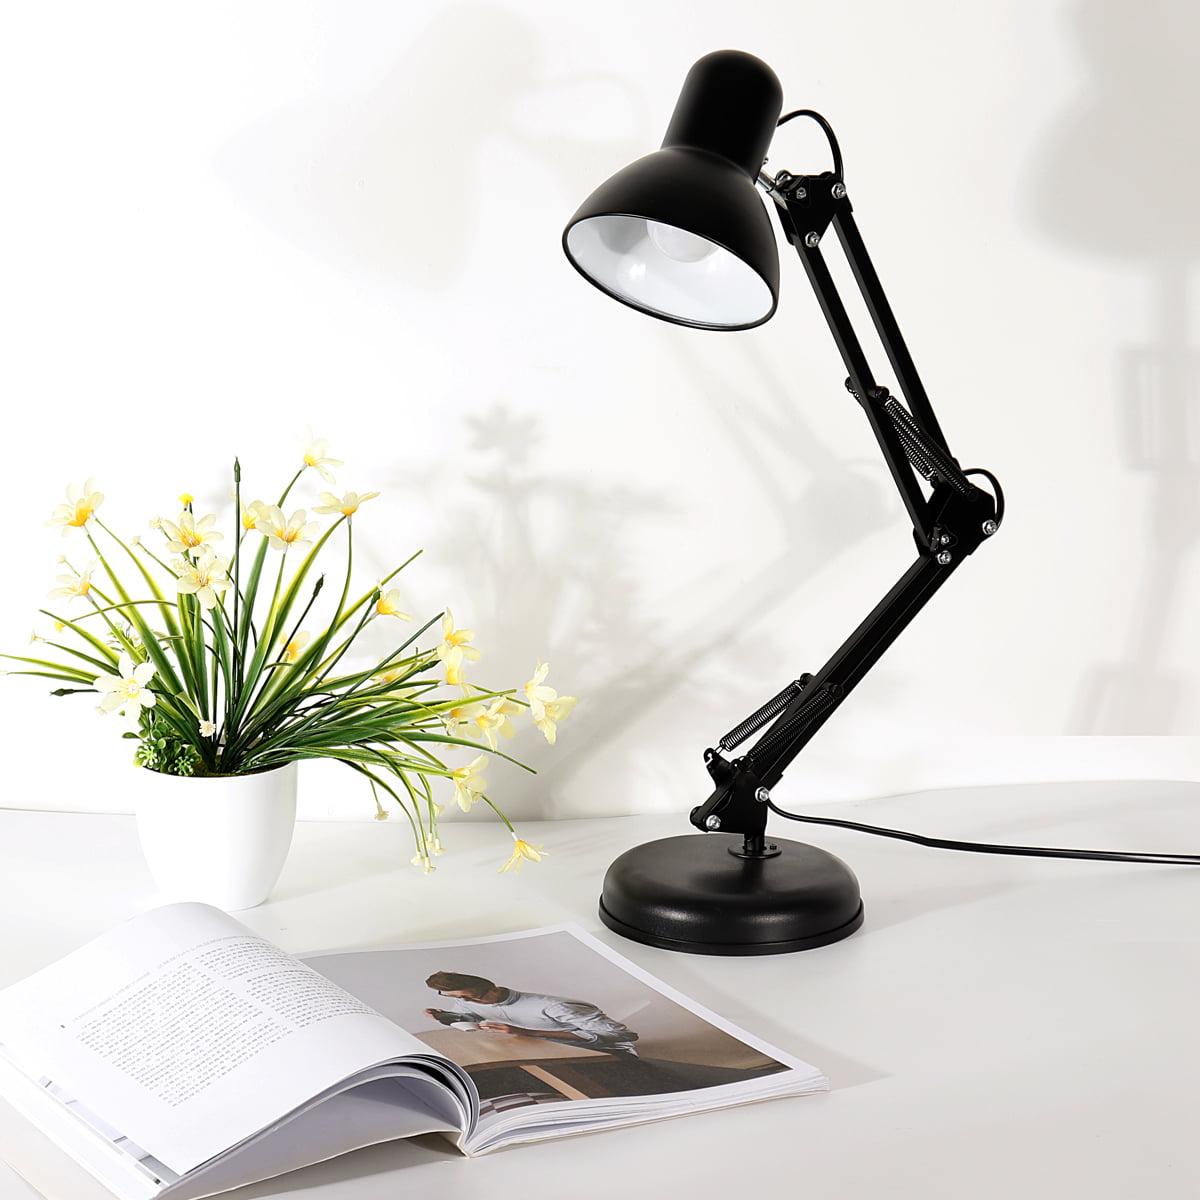 Image of: 2 In 1 Black Modern Metal Desk Swing Arm Clamp Light Folding Table Lamp Table Clip For Home Office Walmart Com Walmart Com